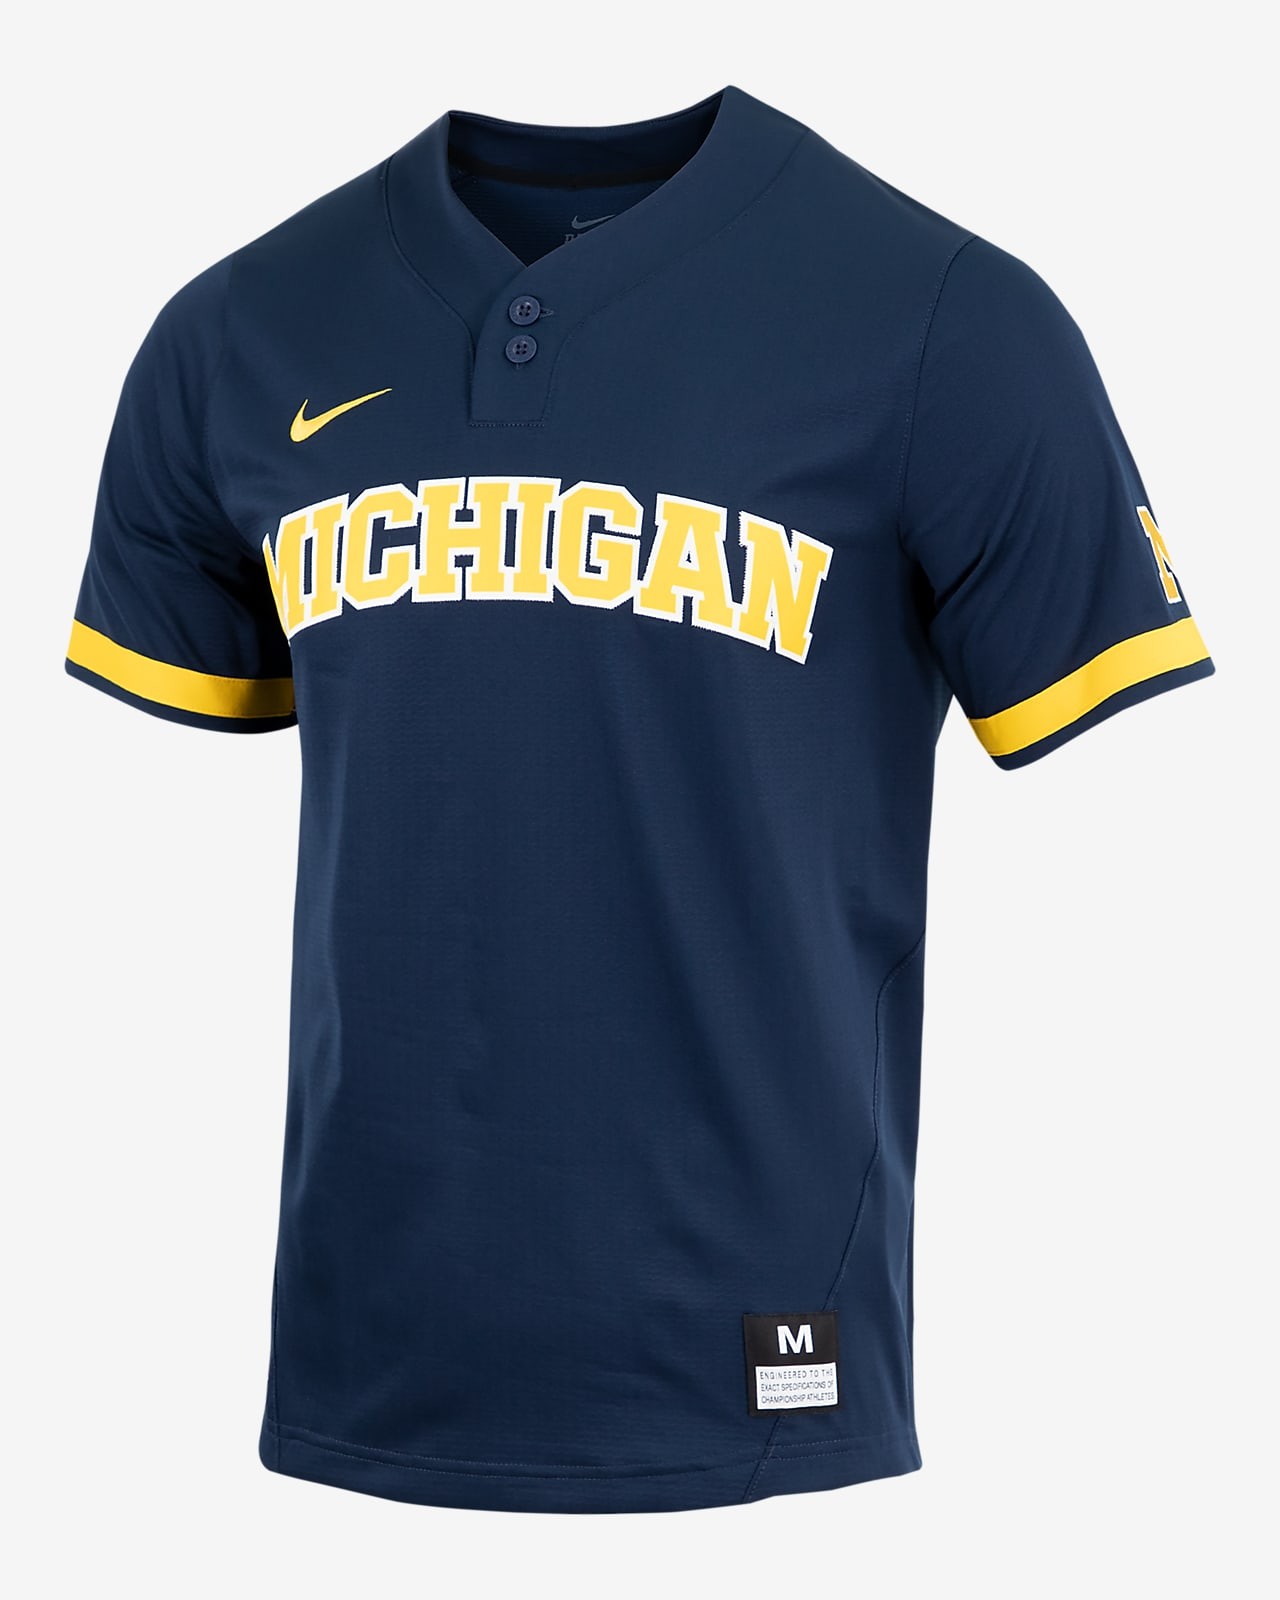 Nike College (Michigan) Men's 2-Button Baseball Jersey